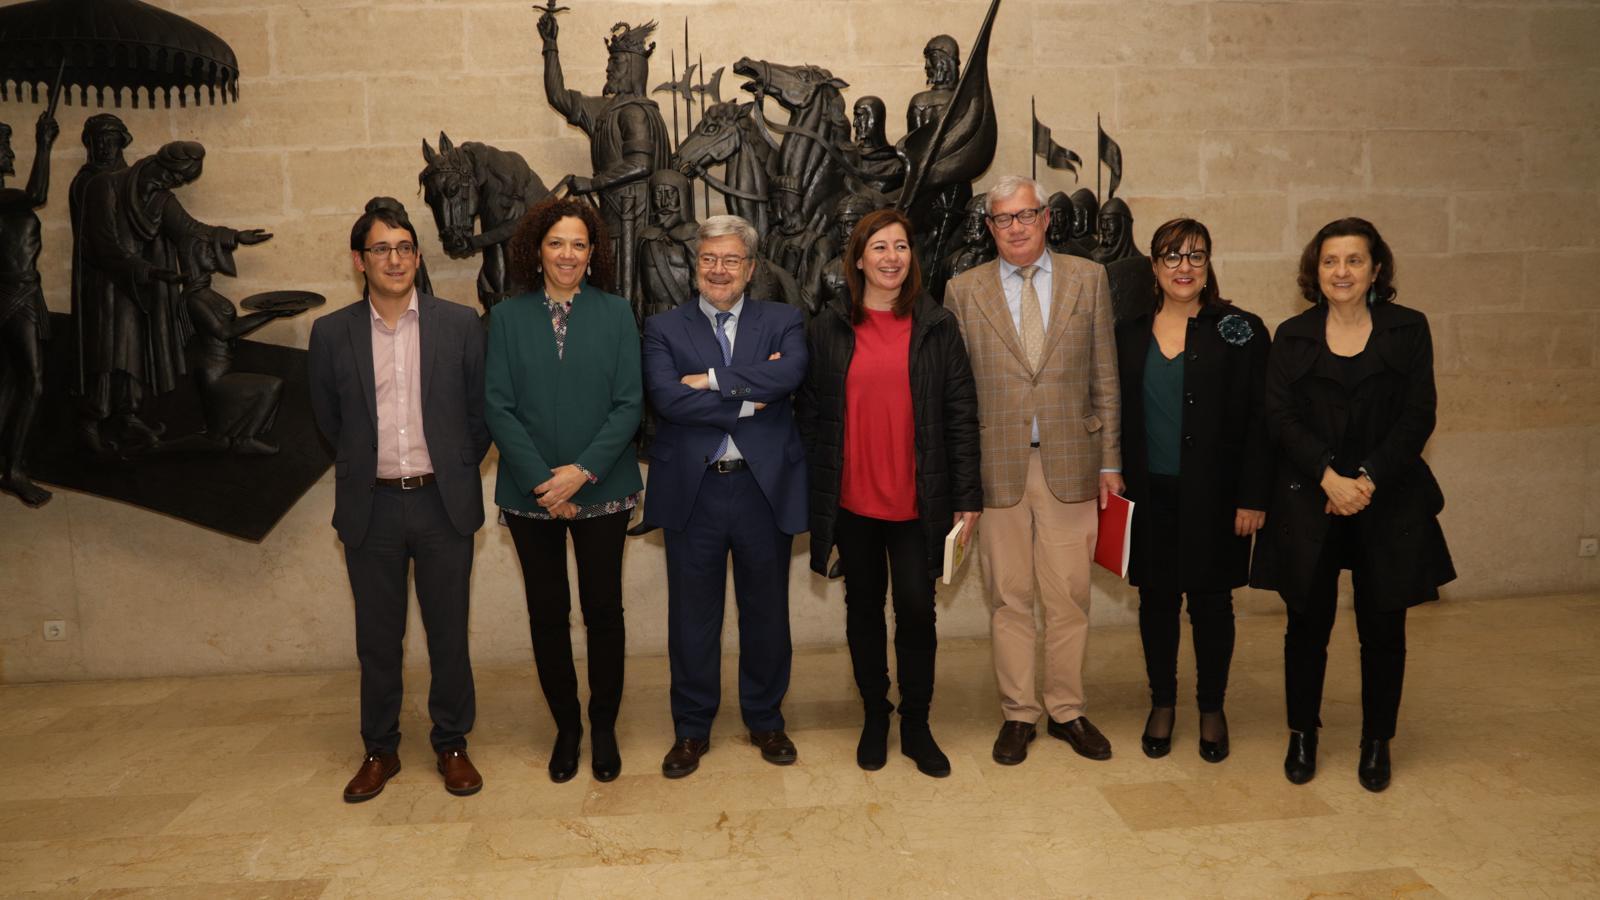 Negueruela, Claadera, López Casasnovas, Armengol, Roses, Busquets, Santiago